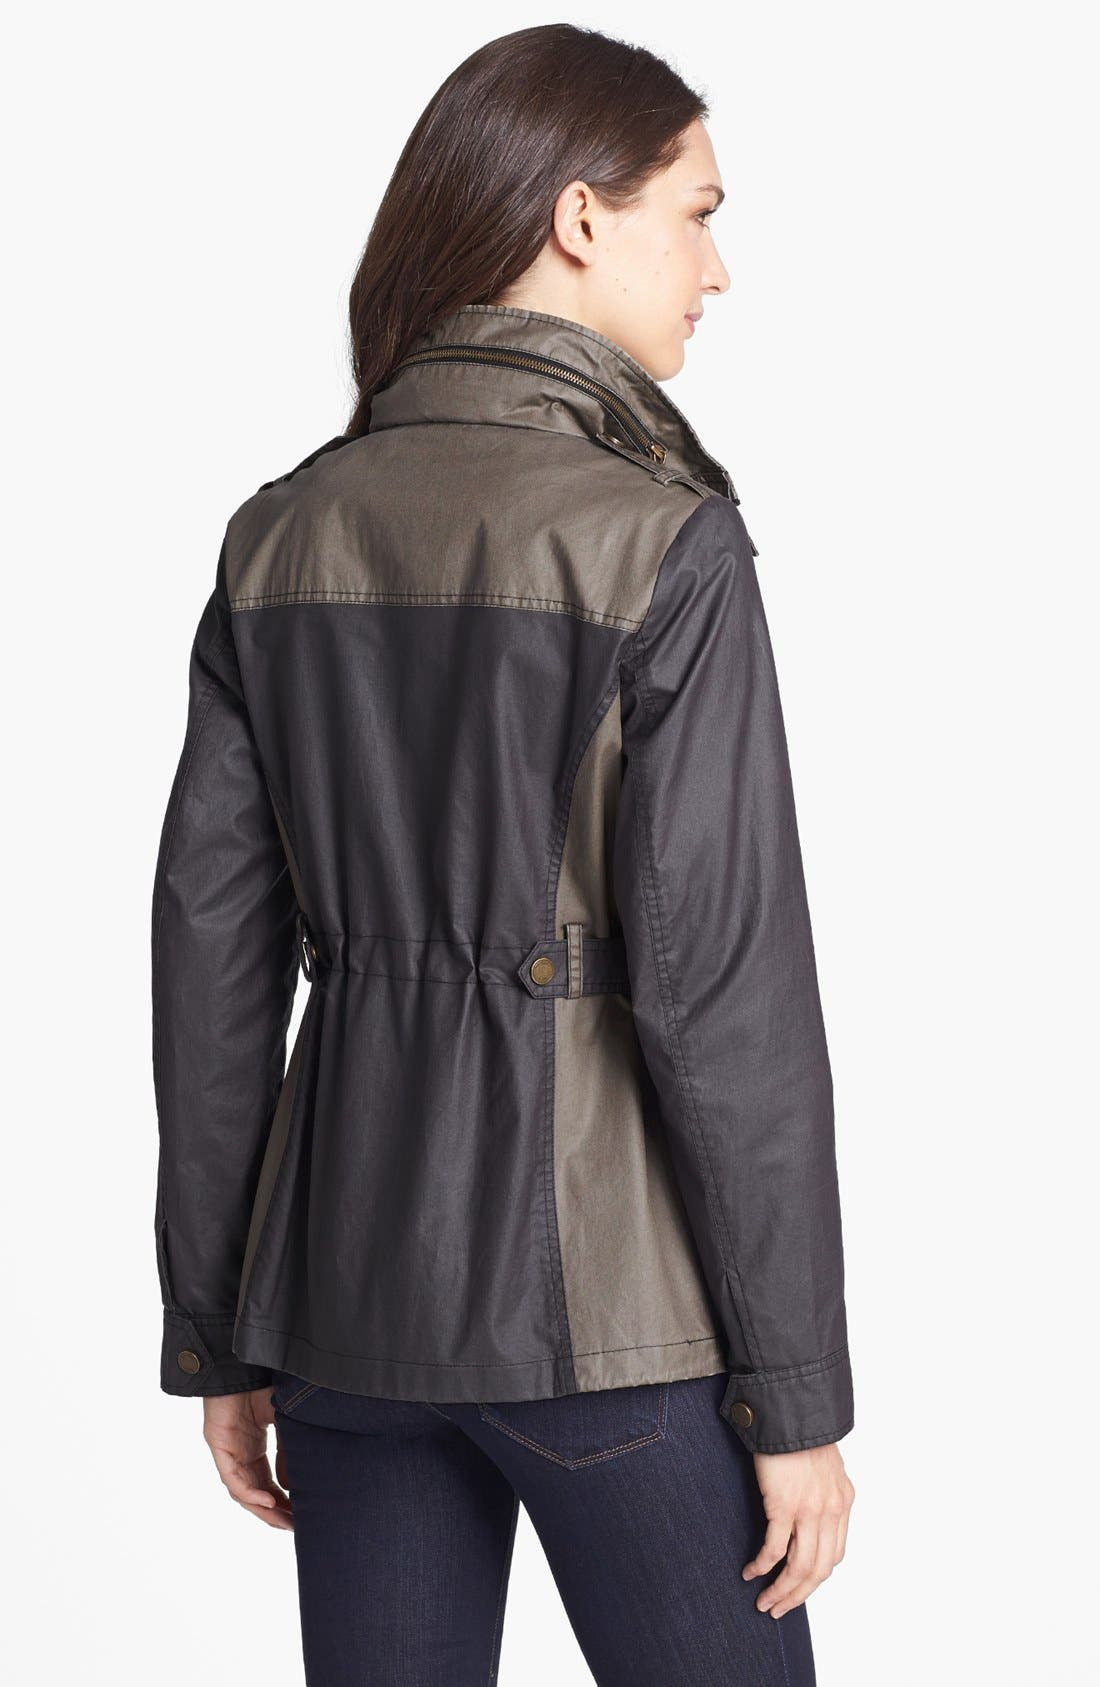 Waxed Cotton Field Jacket,                             Alternate thumbnail 2, color,                             310